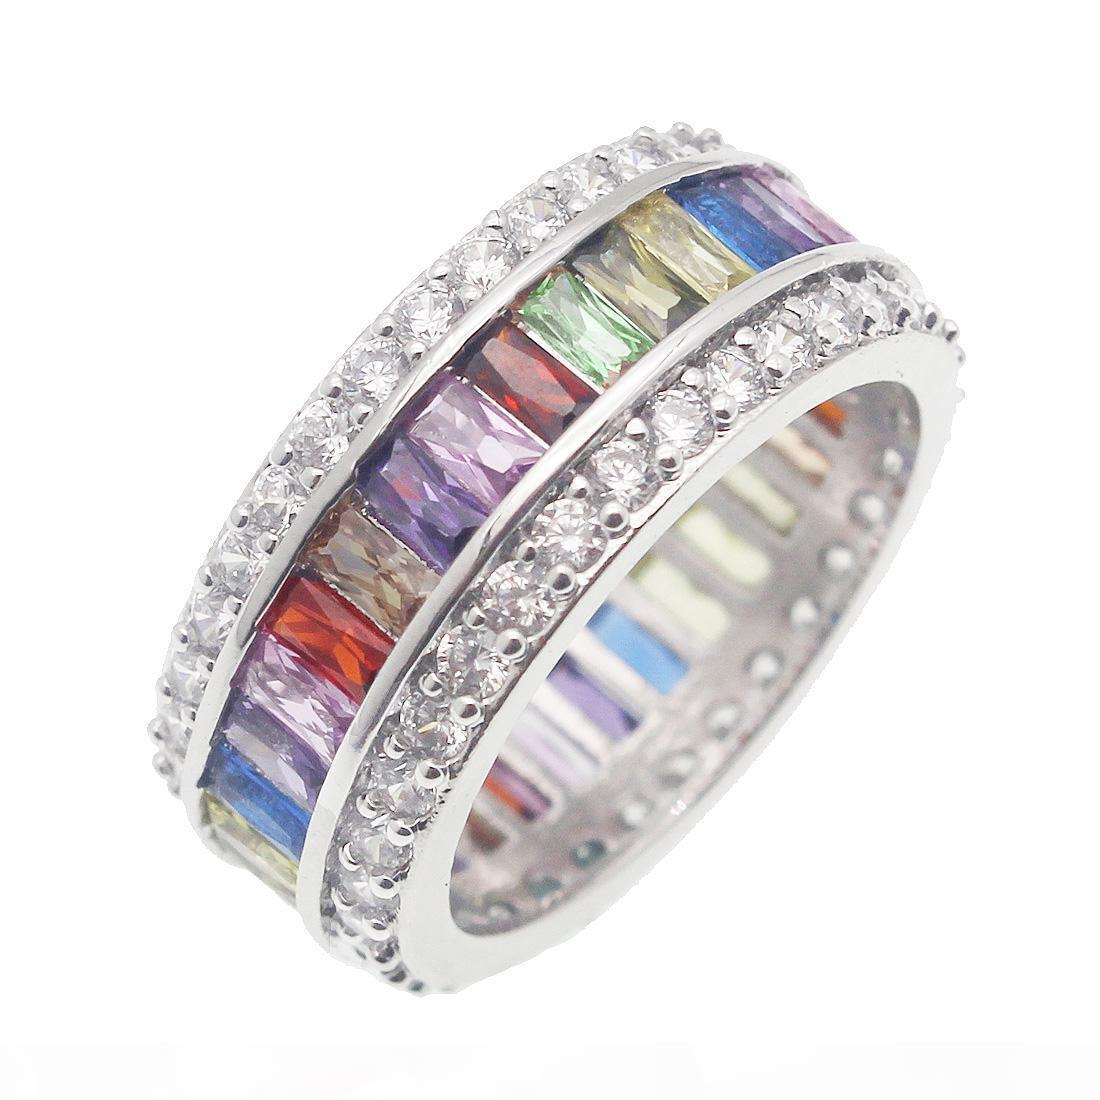 Wedding Ring monili del regalo di moda ametista Peridot del Morganite donne 925 Silver Crystal Gemstone Natural Garnet